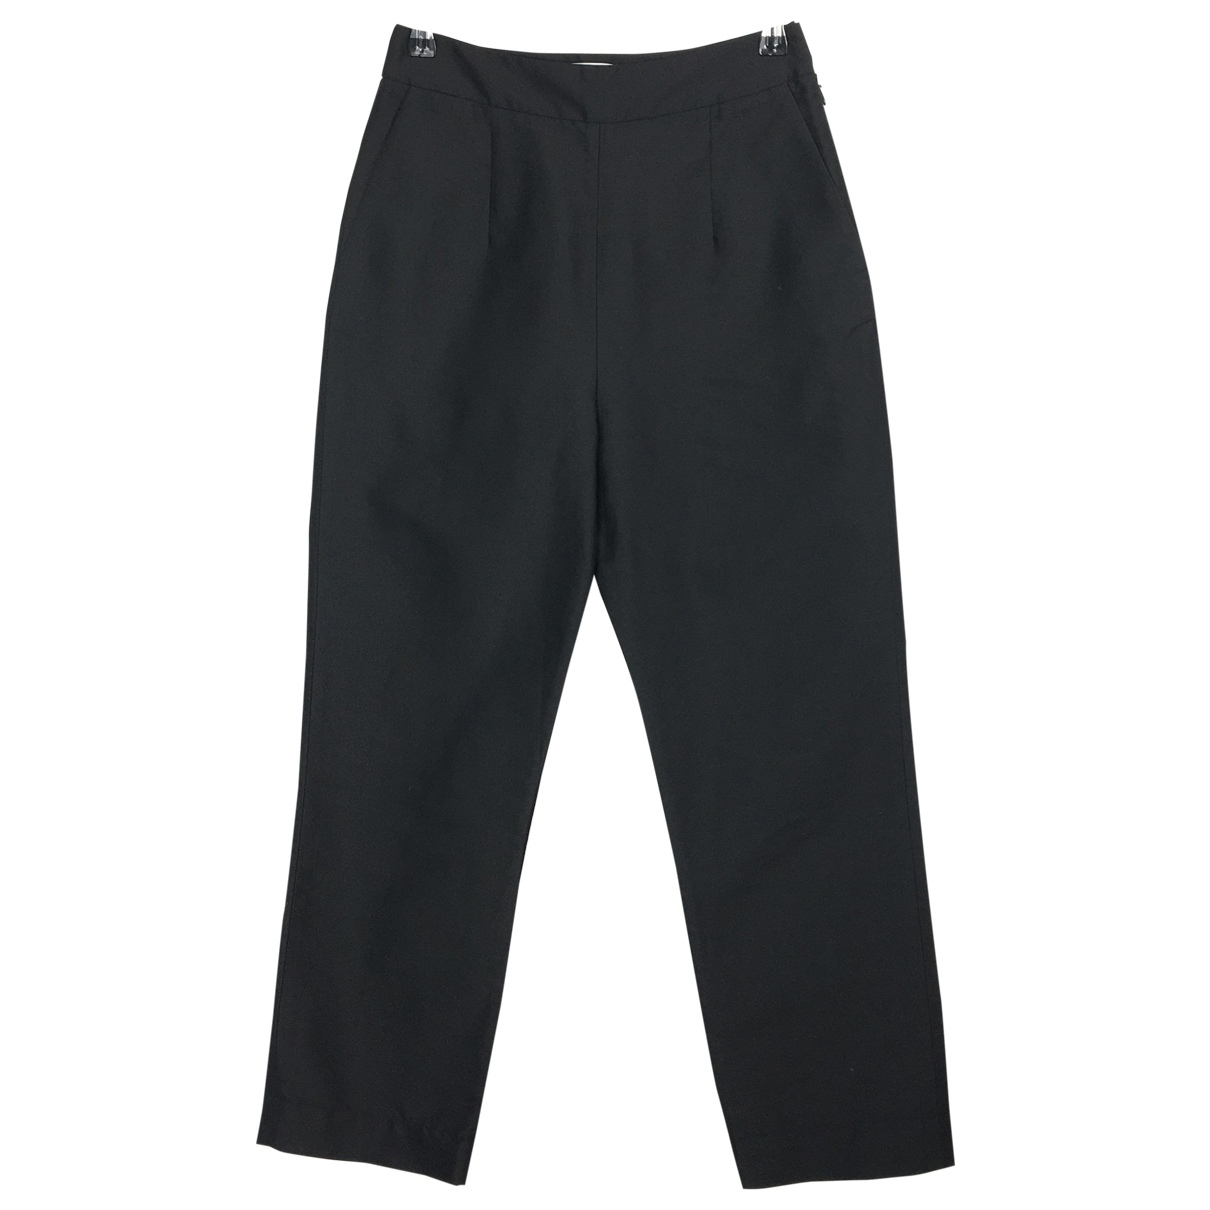 Isa Arfen \N Black Silk Trousers for Women 8 UK